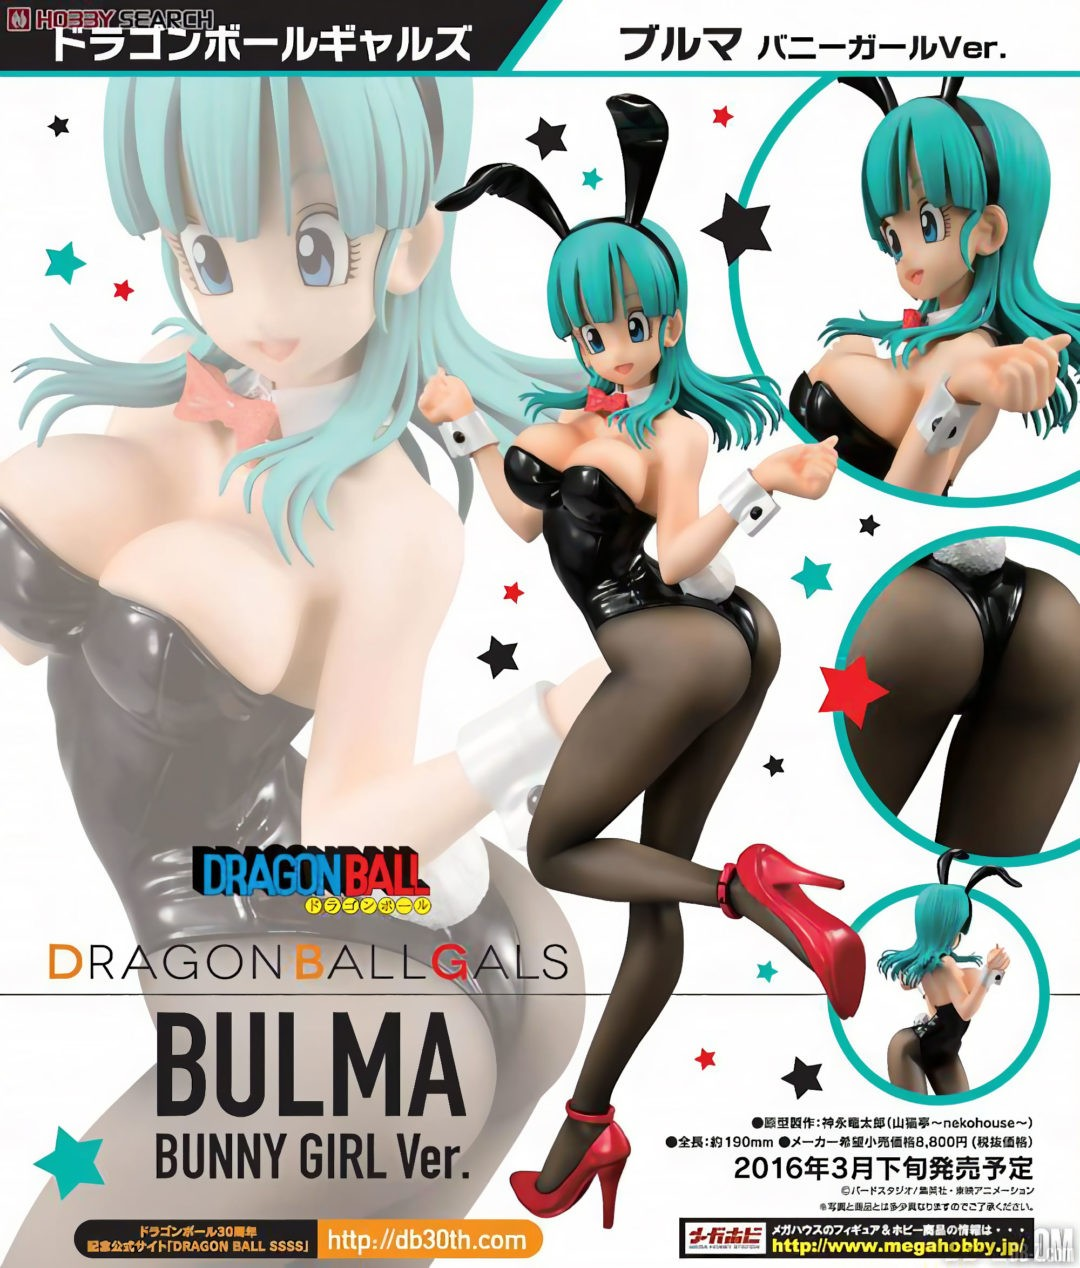 Dragon-Ball-Gals-Bulma-Bunny-Girl-hd